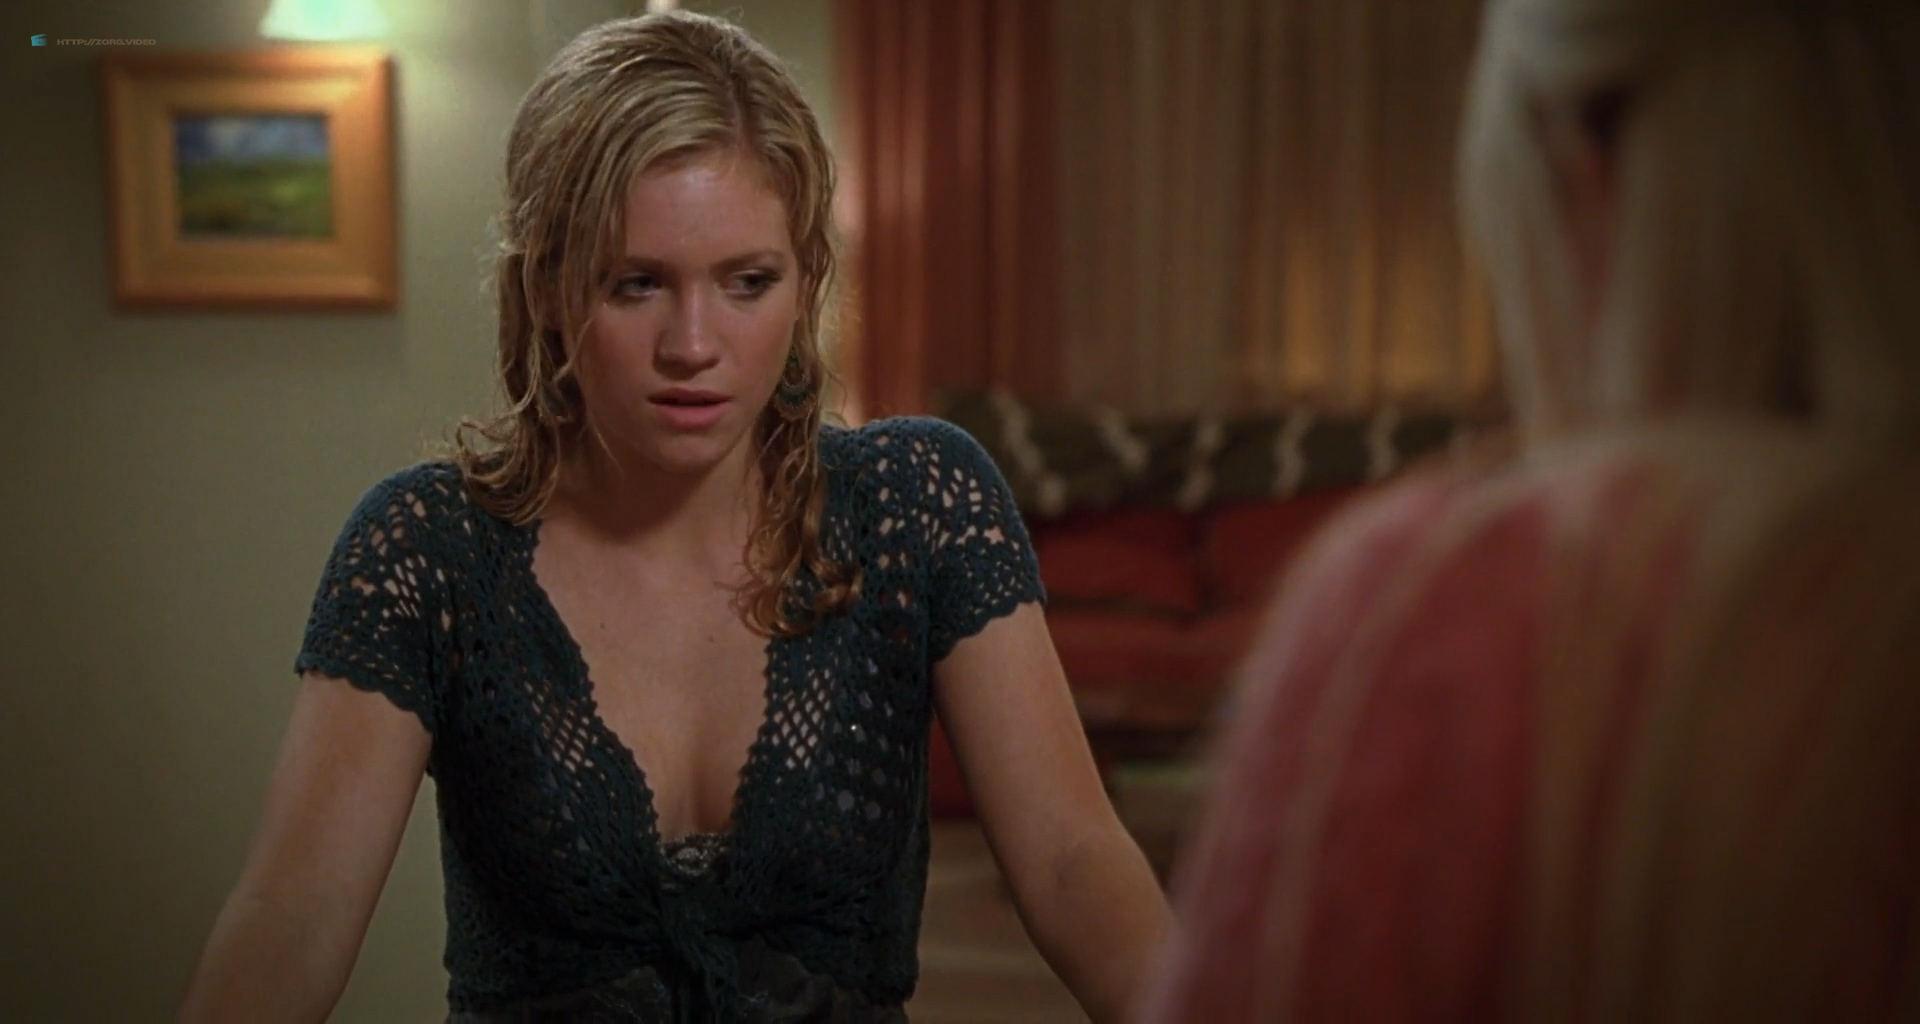 Brittany Snow hot in lingerie Sophia Bush, Arielle Kebbel, Ashanti hot and sexy - John Tucker Must Die (2006) HD 1080p (15)